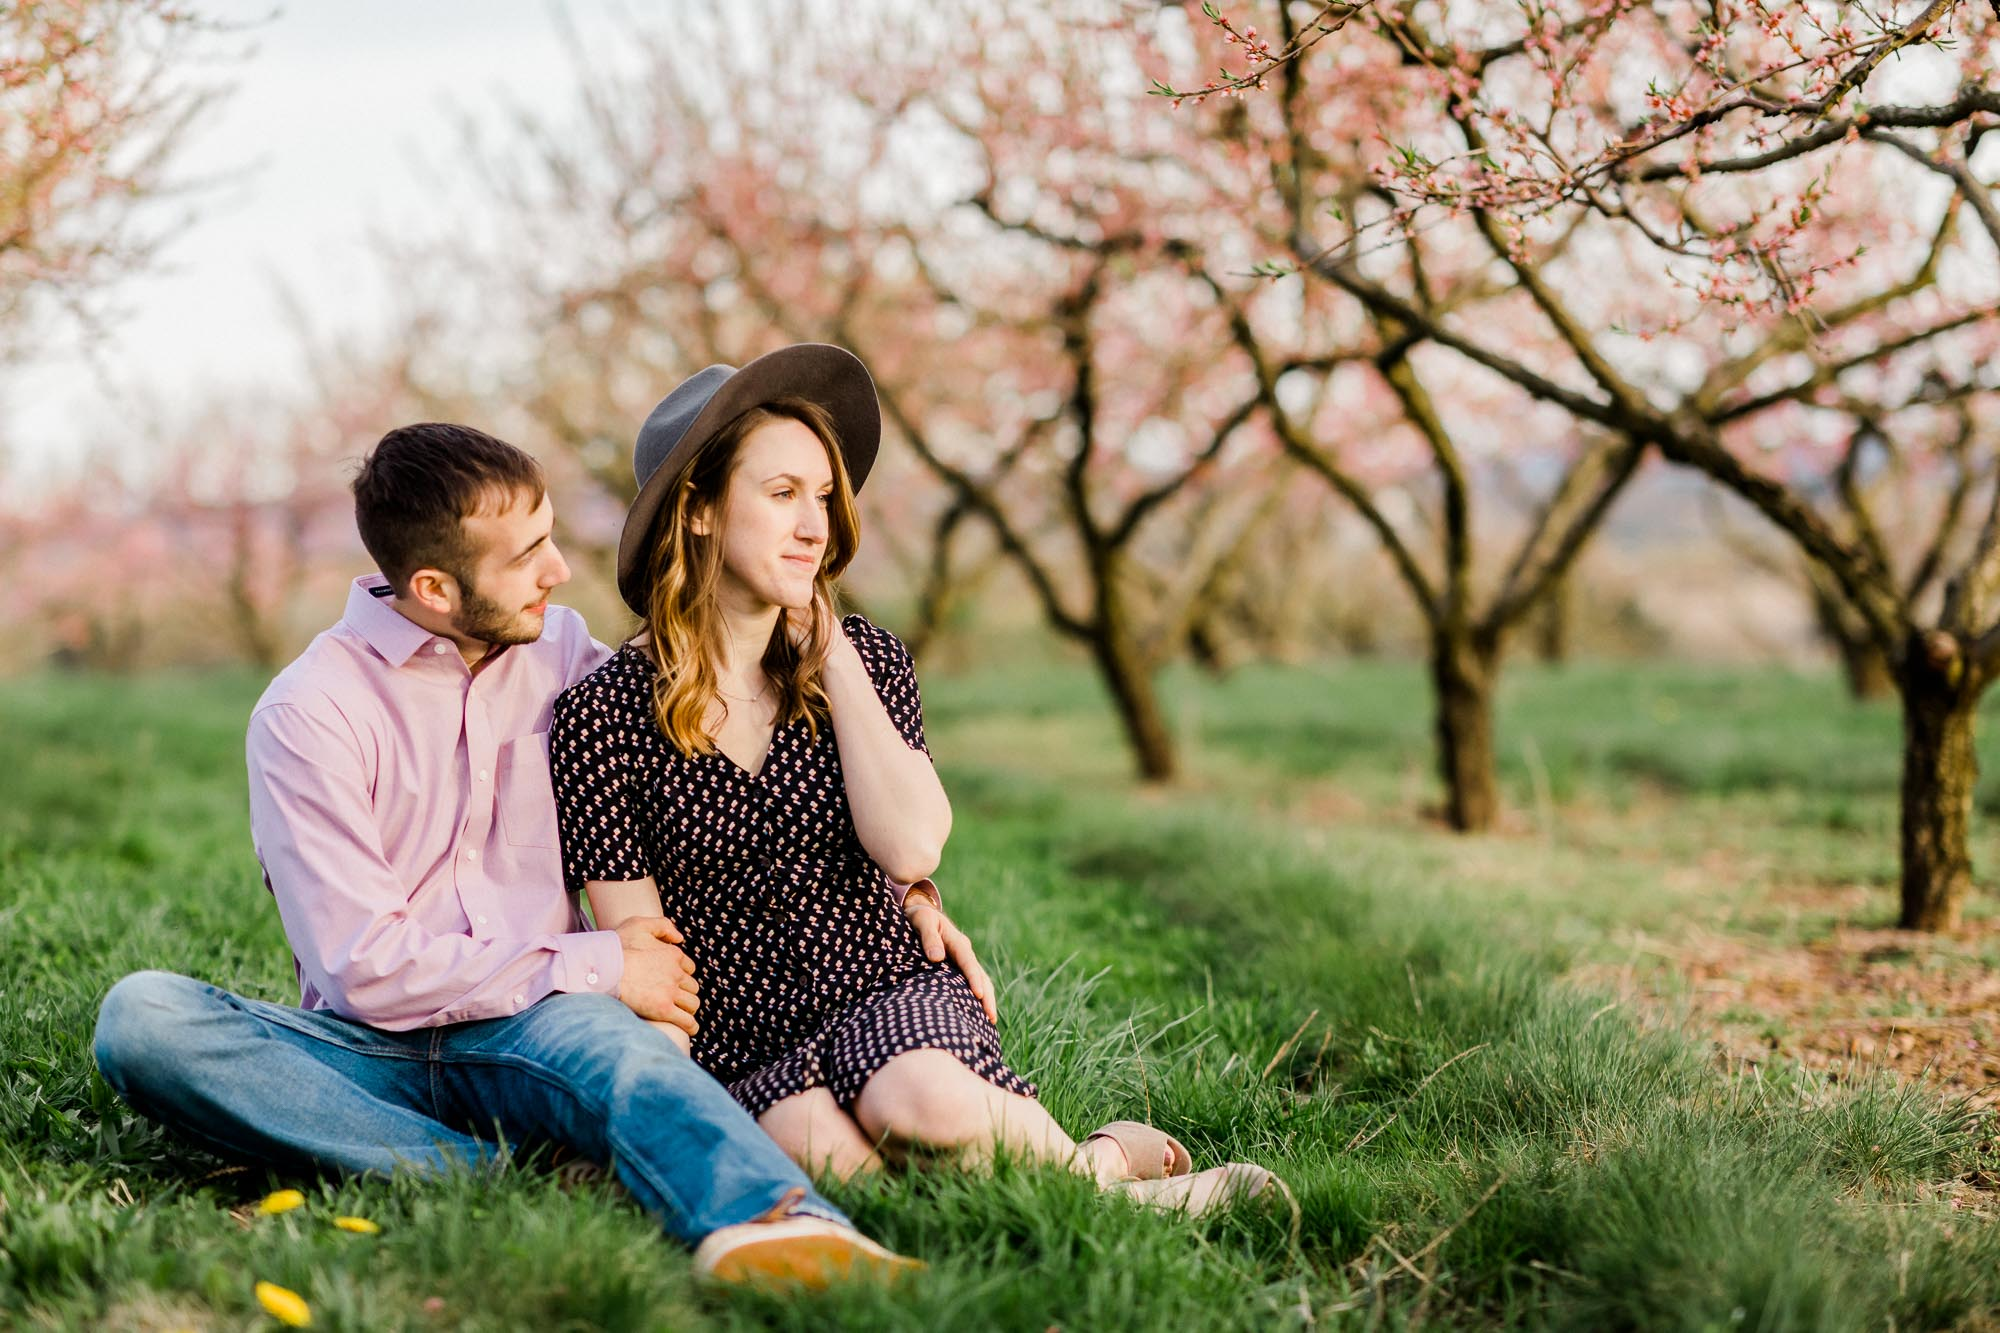 Rohrbachs-Spring-cherry-blossom-engagement-7550.jpg